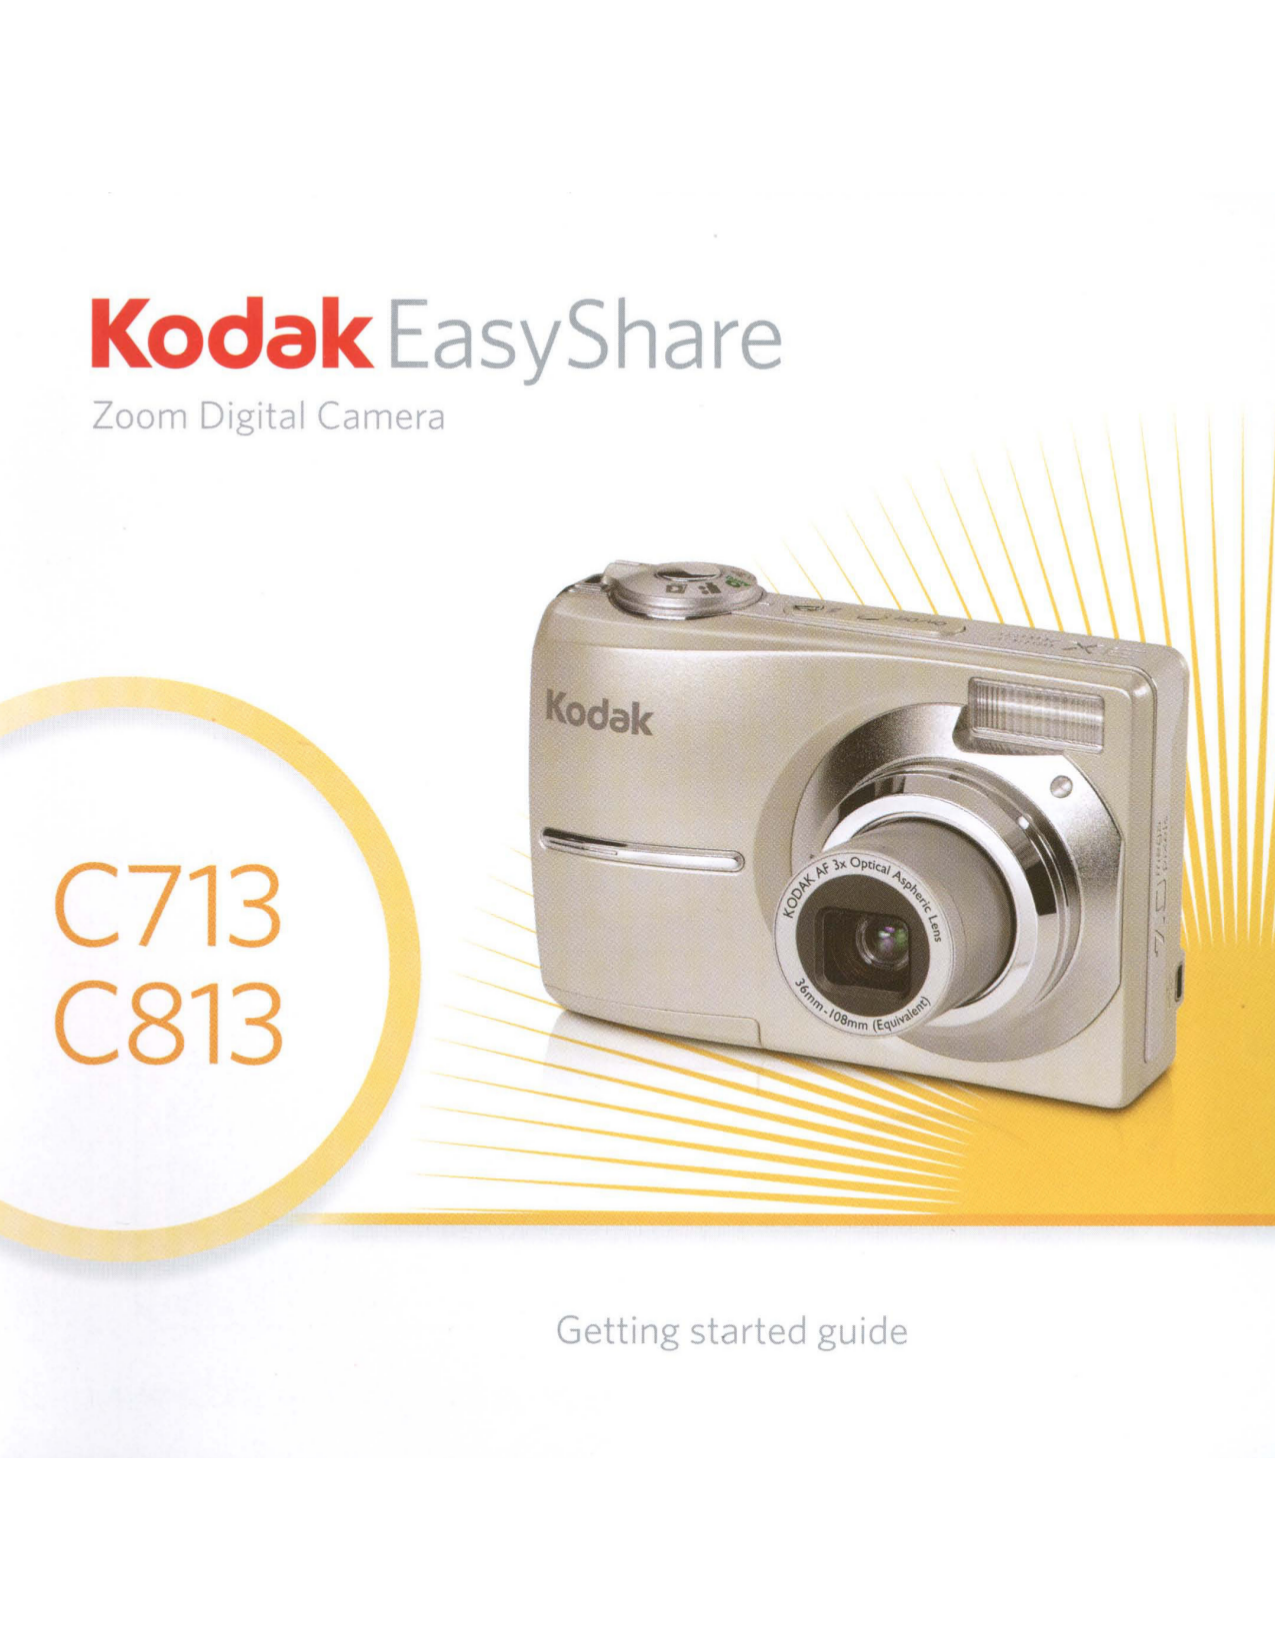 download free pdf for kodak easyshare c813 digital camera manual rh umlib com kodak easyshare c813 manual free kodak easyshare c813 manuale italiano